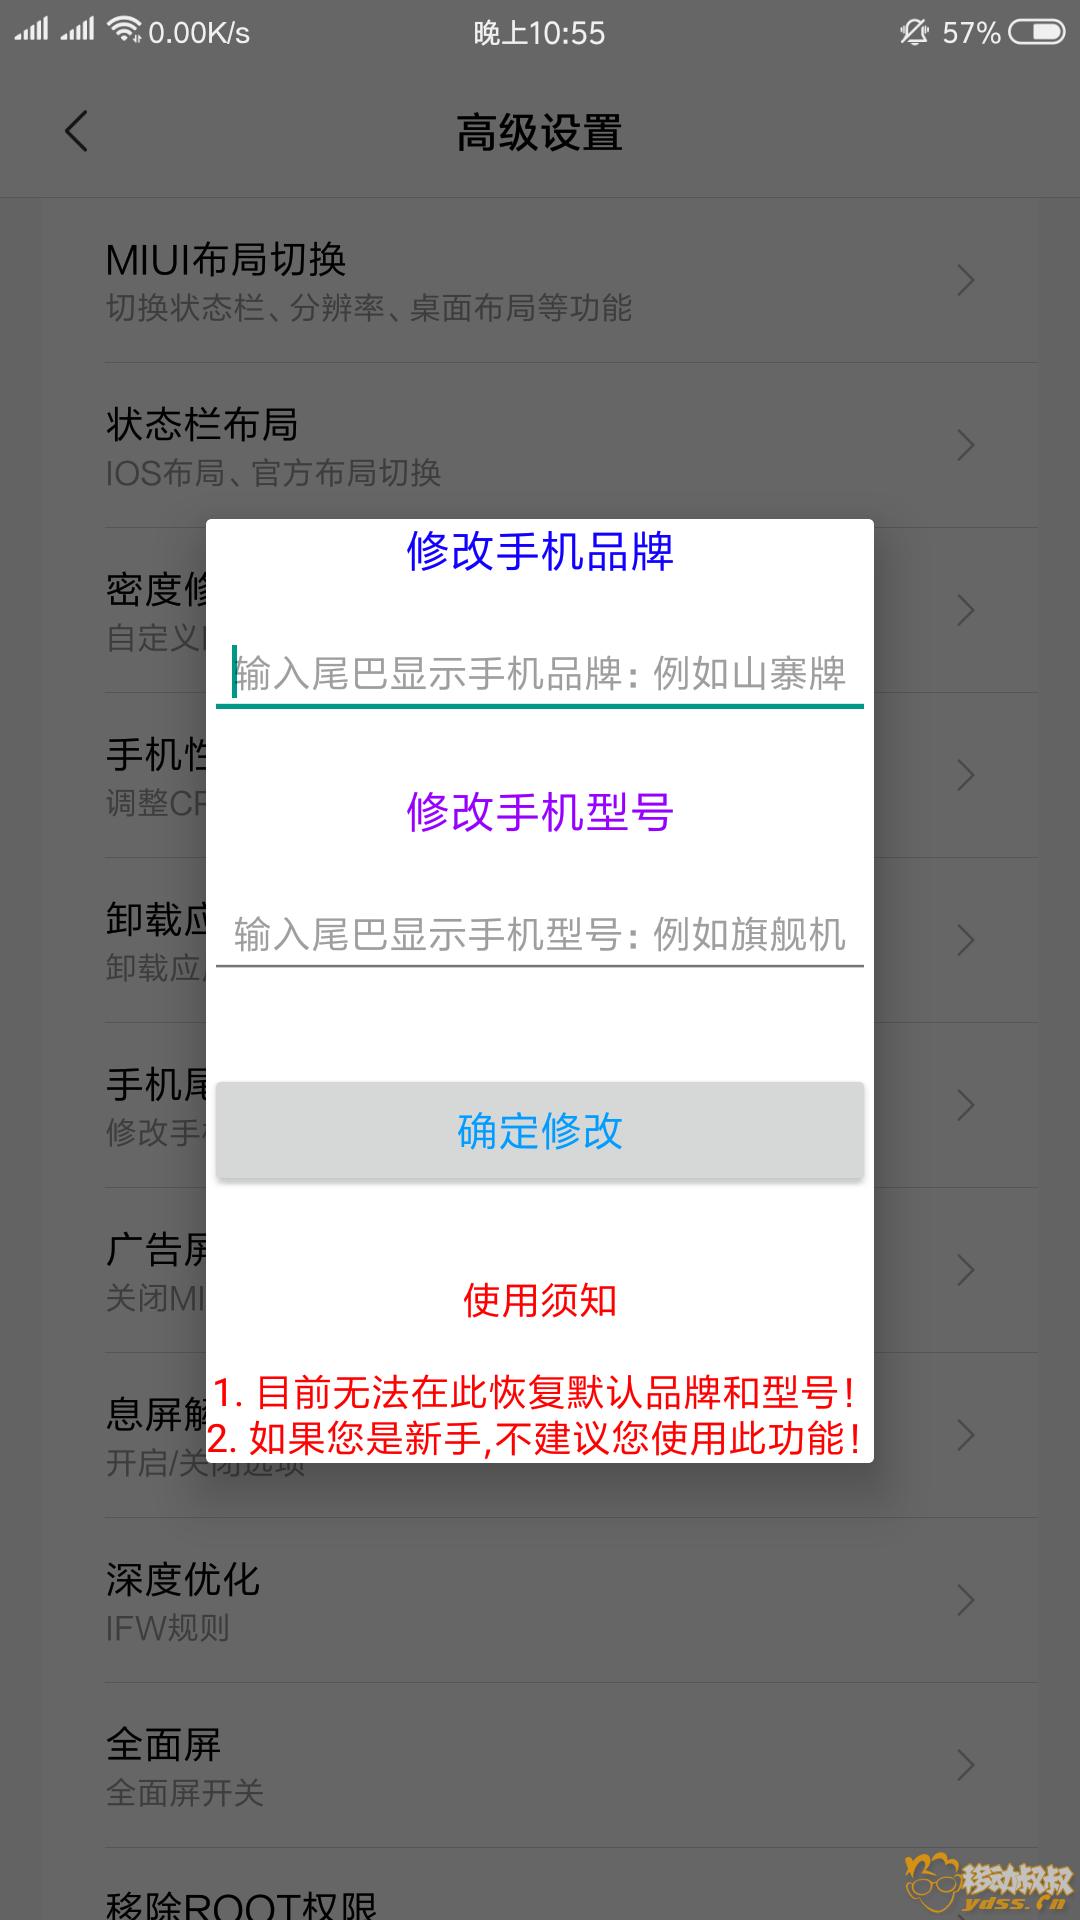 Screenshot_2018-09-14-22-55-50-572_com.zhanhong.tools.png